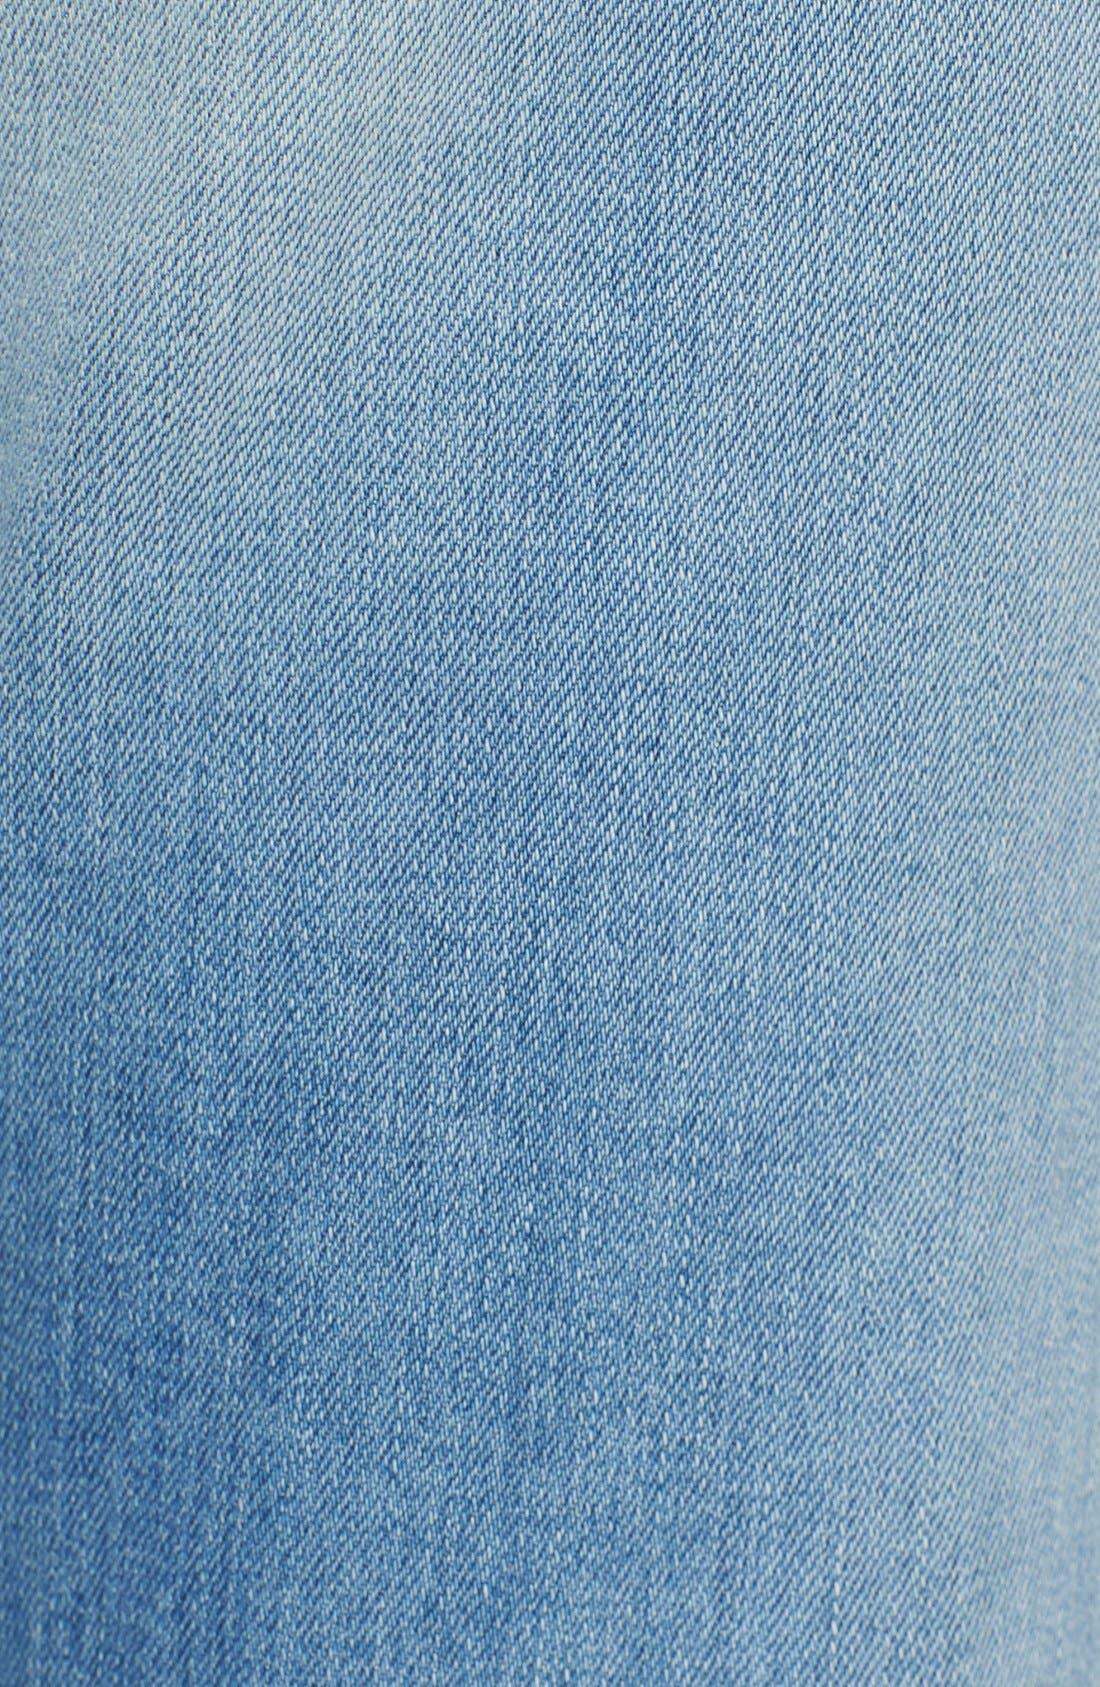 Alternate Image 5  - rag & bone/JEAN 'Beach' High Rise Bell Bottom Jeans (Ryder)